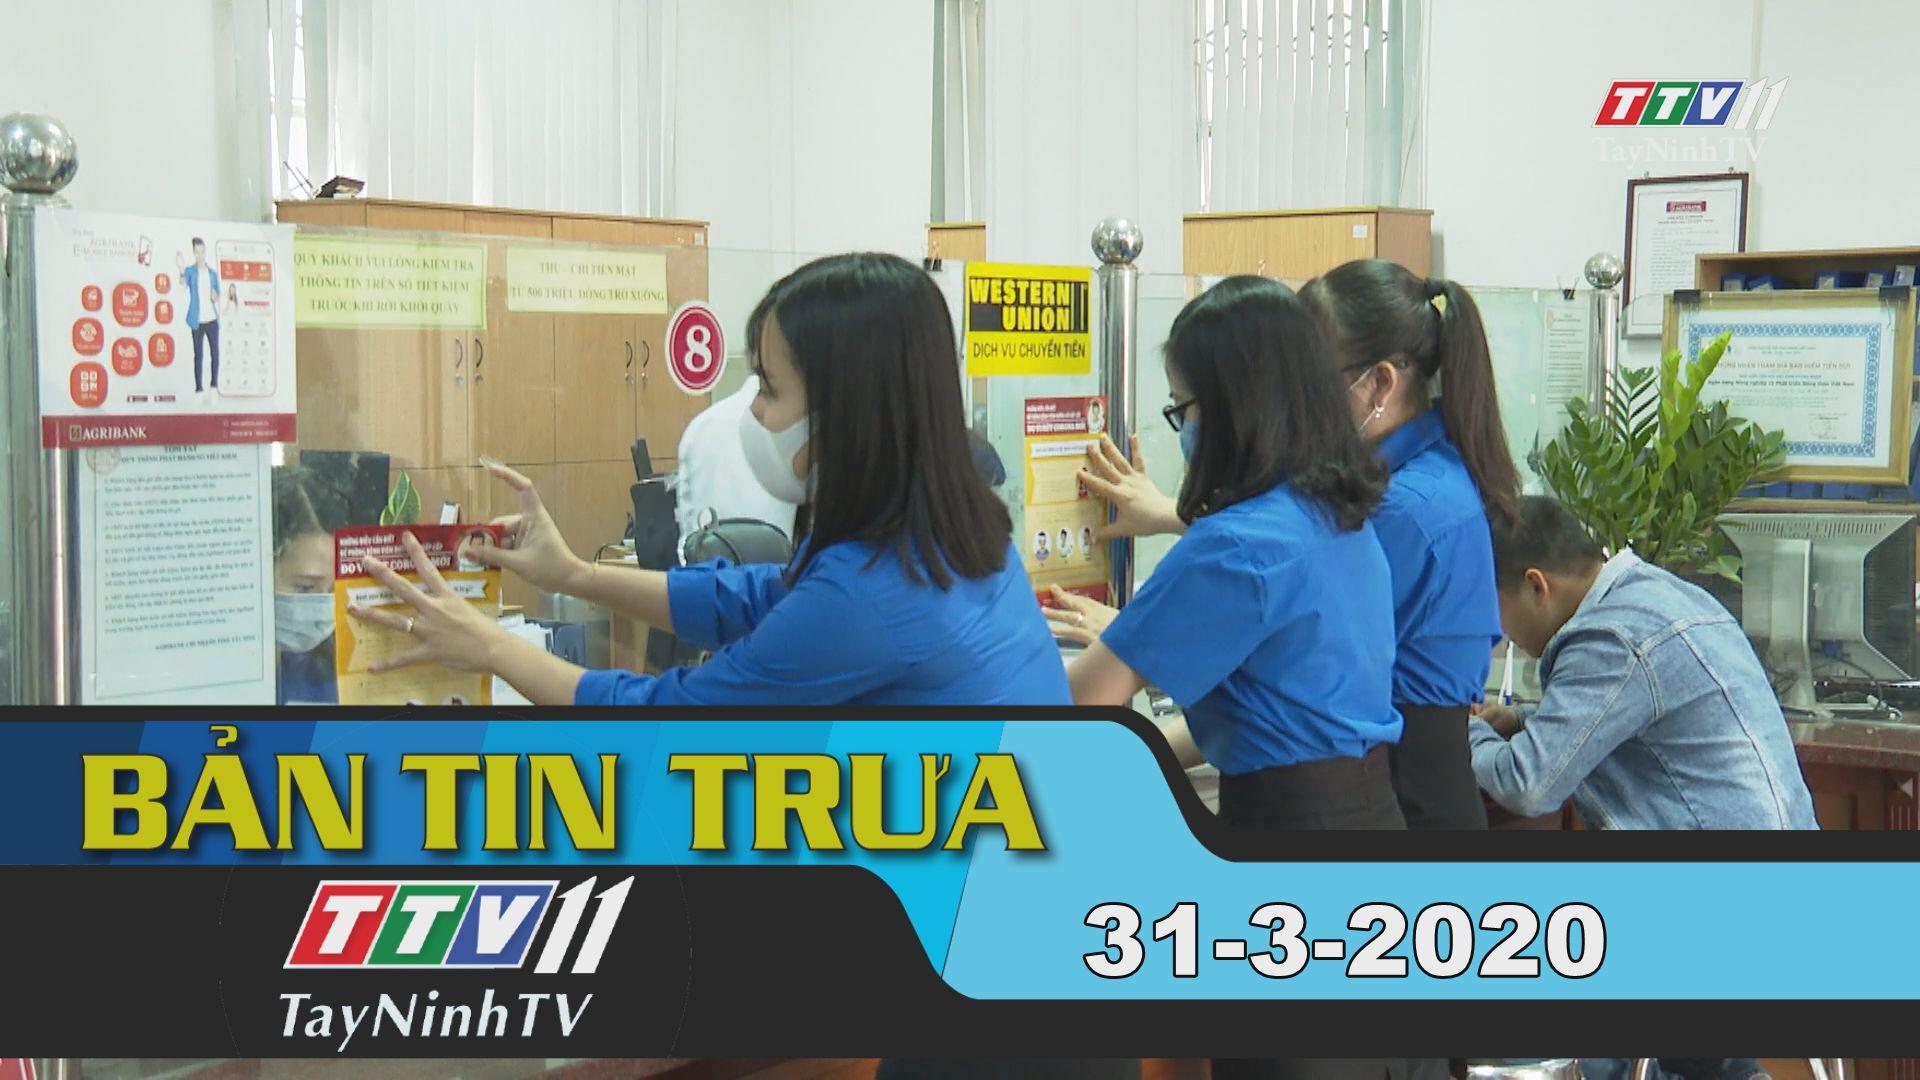 Bản tin trưa 31-3-2020 | Tin tức hôm nay | TayNinhTV